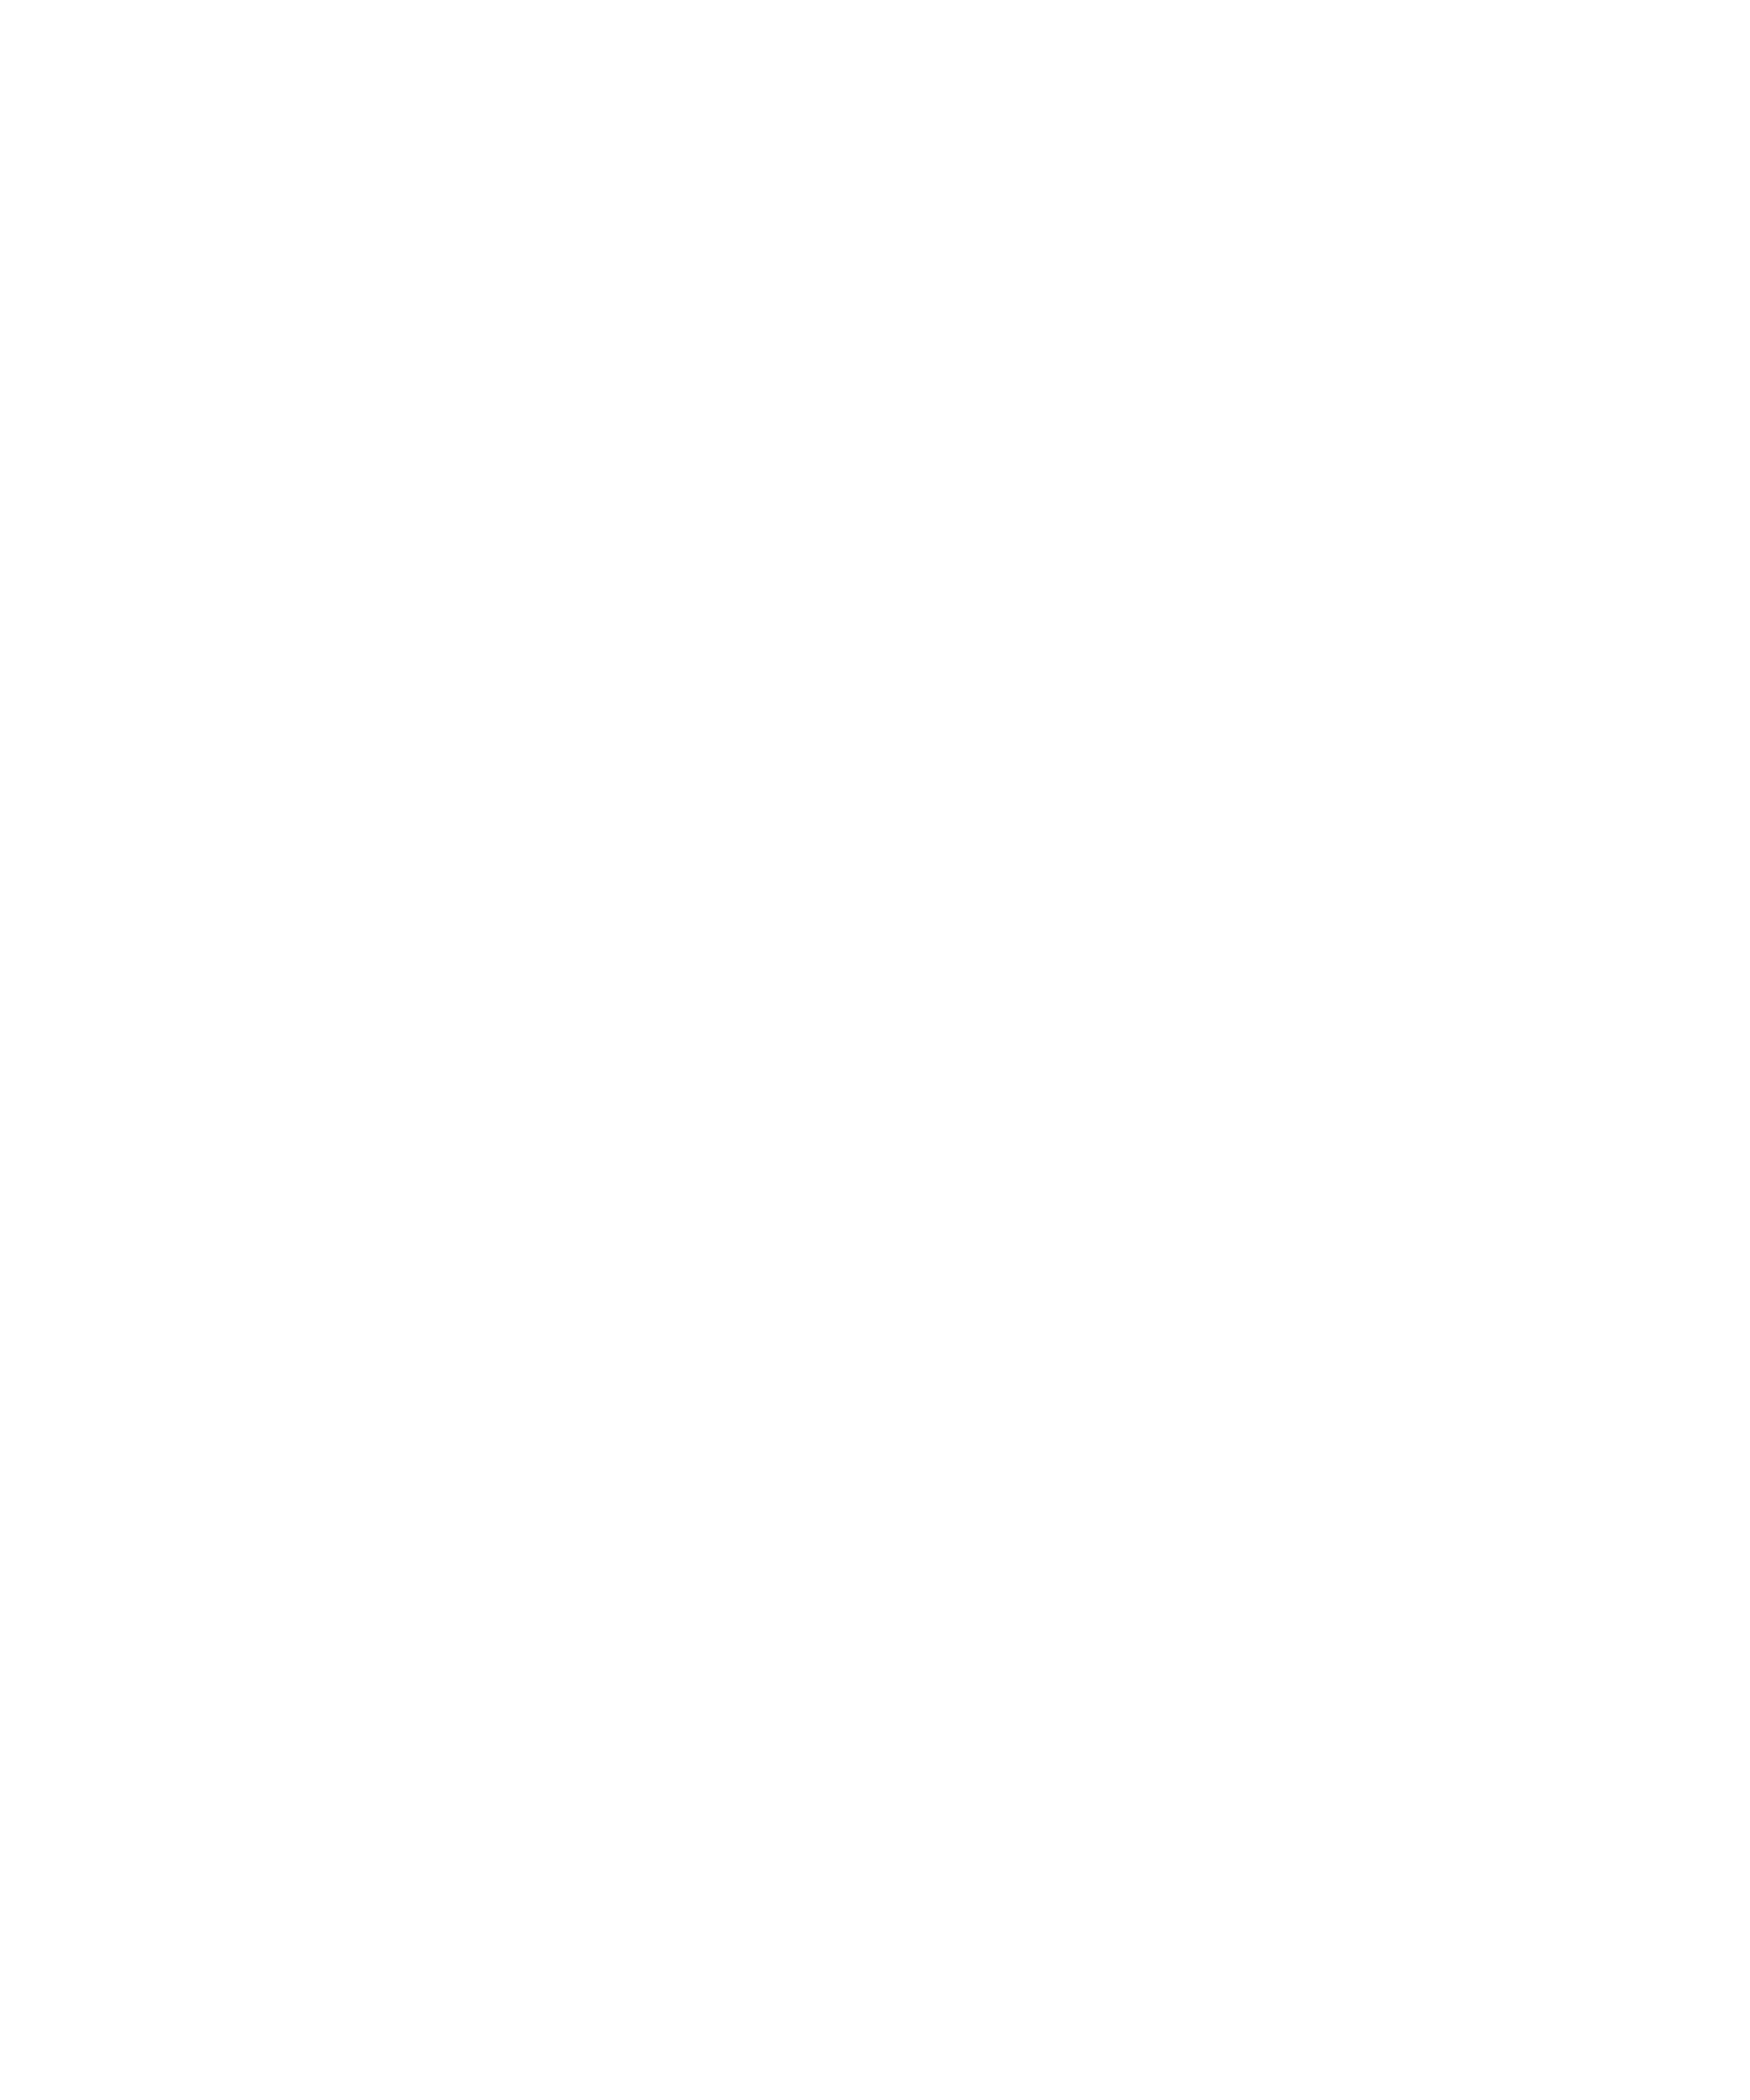 NEW BRAAAP CITY